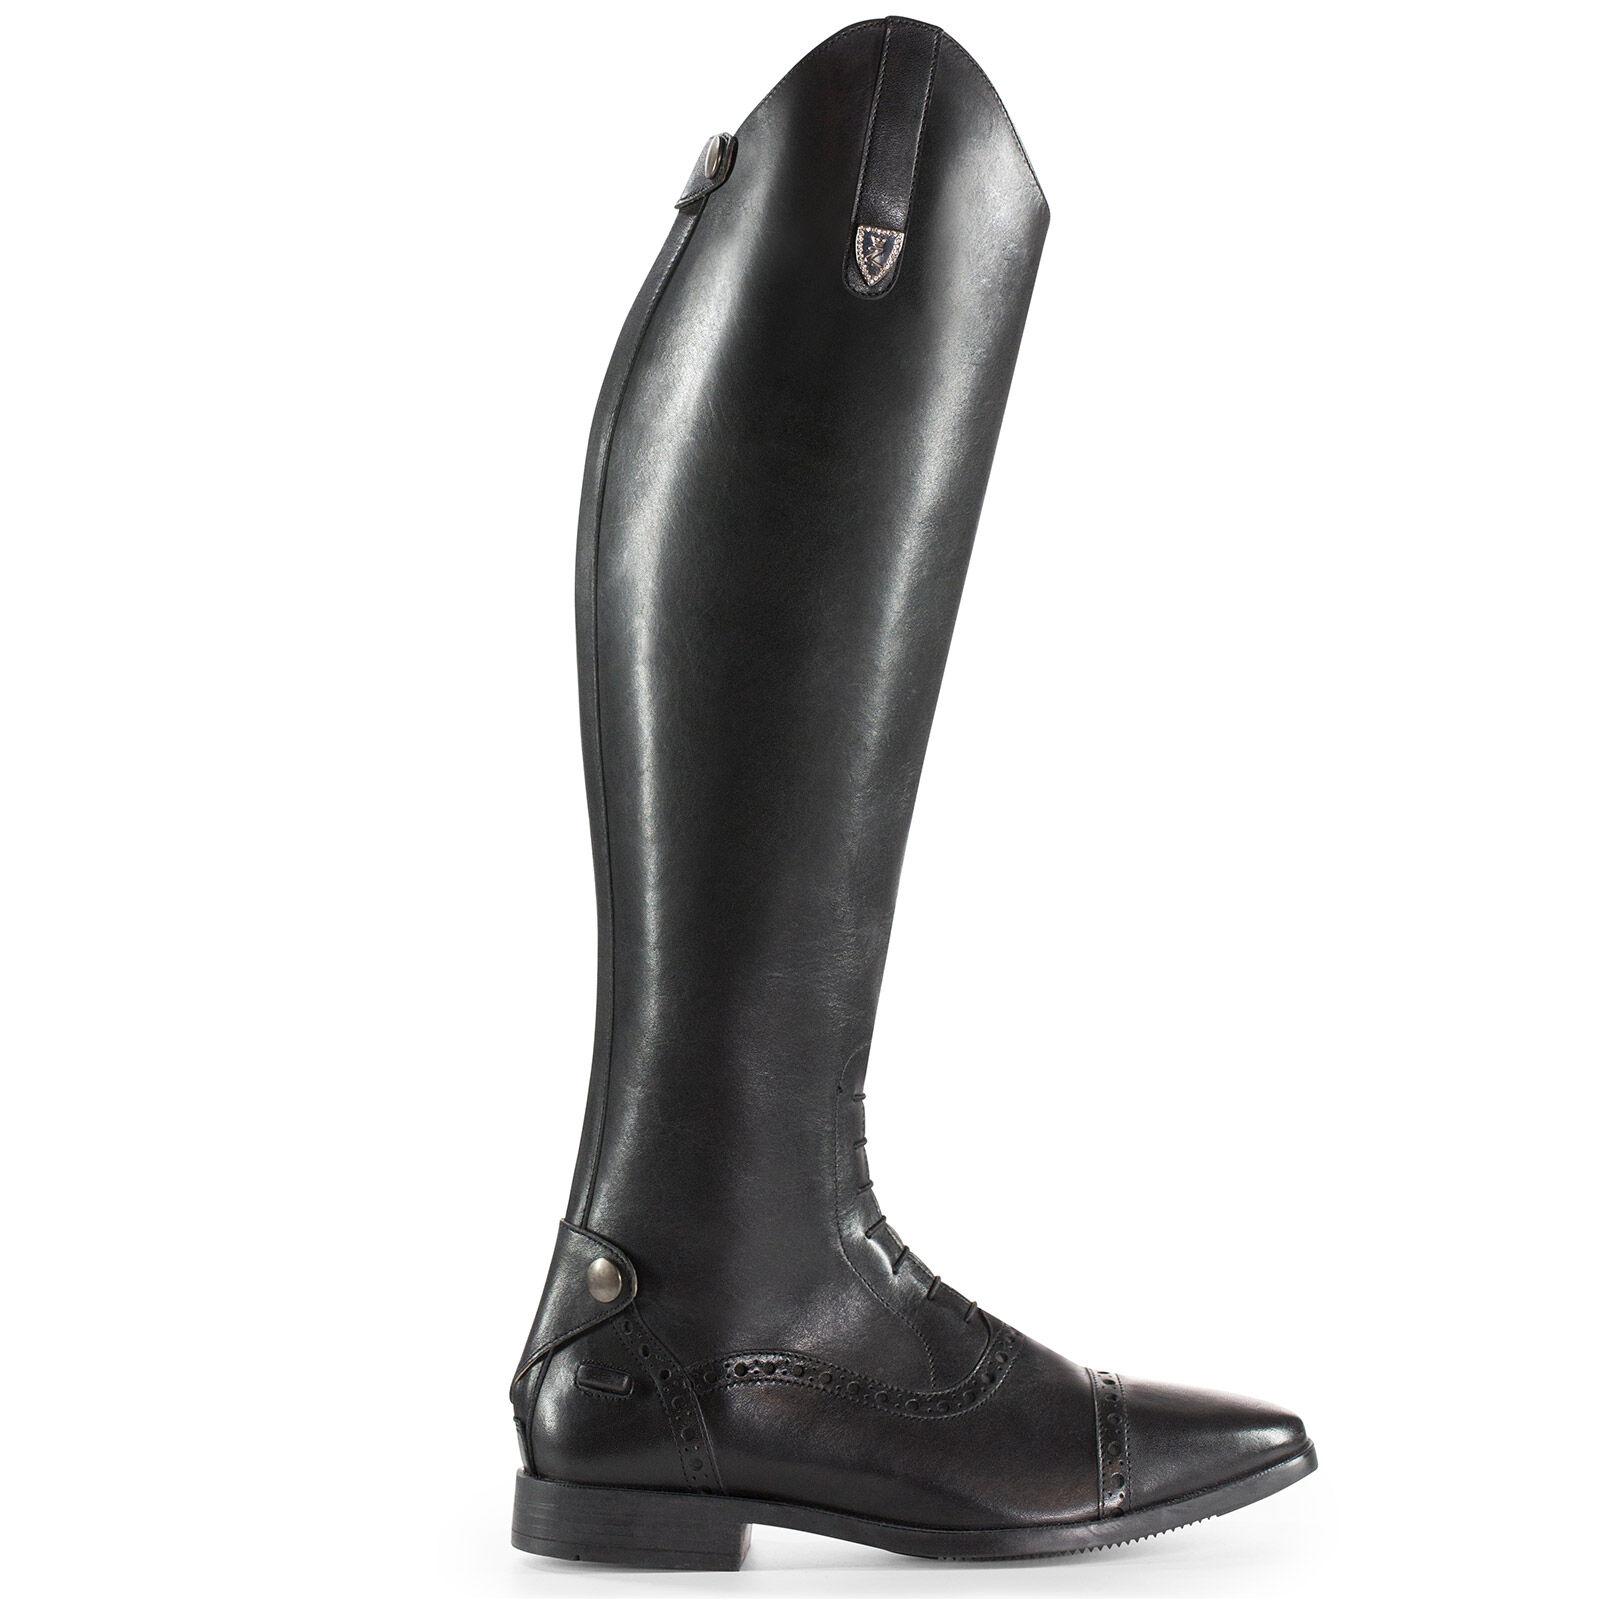 Boots Tall Genuine Winslow Horze Leather PuiXOkZT